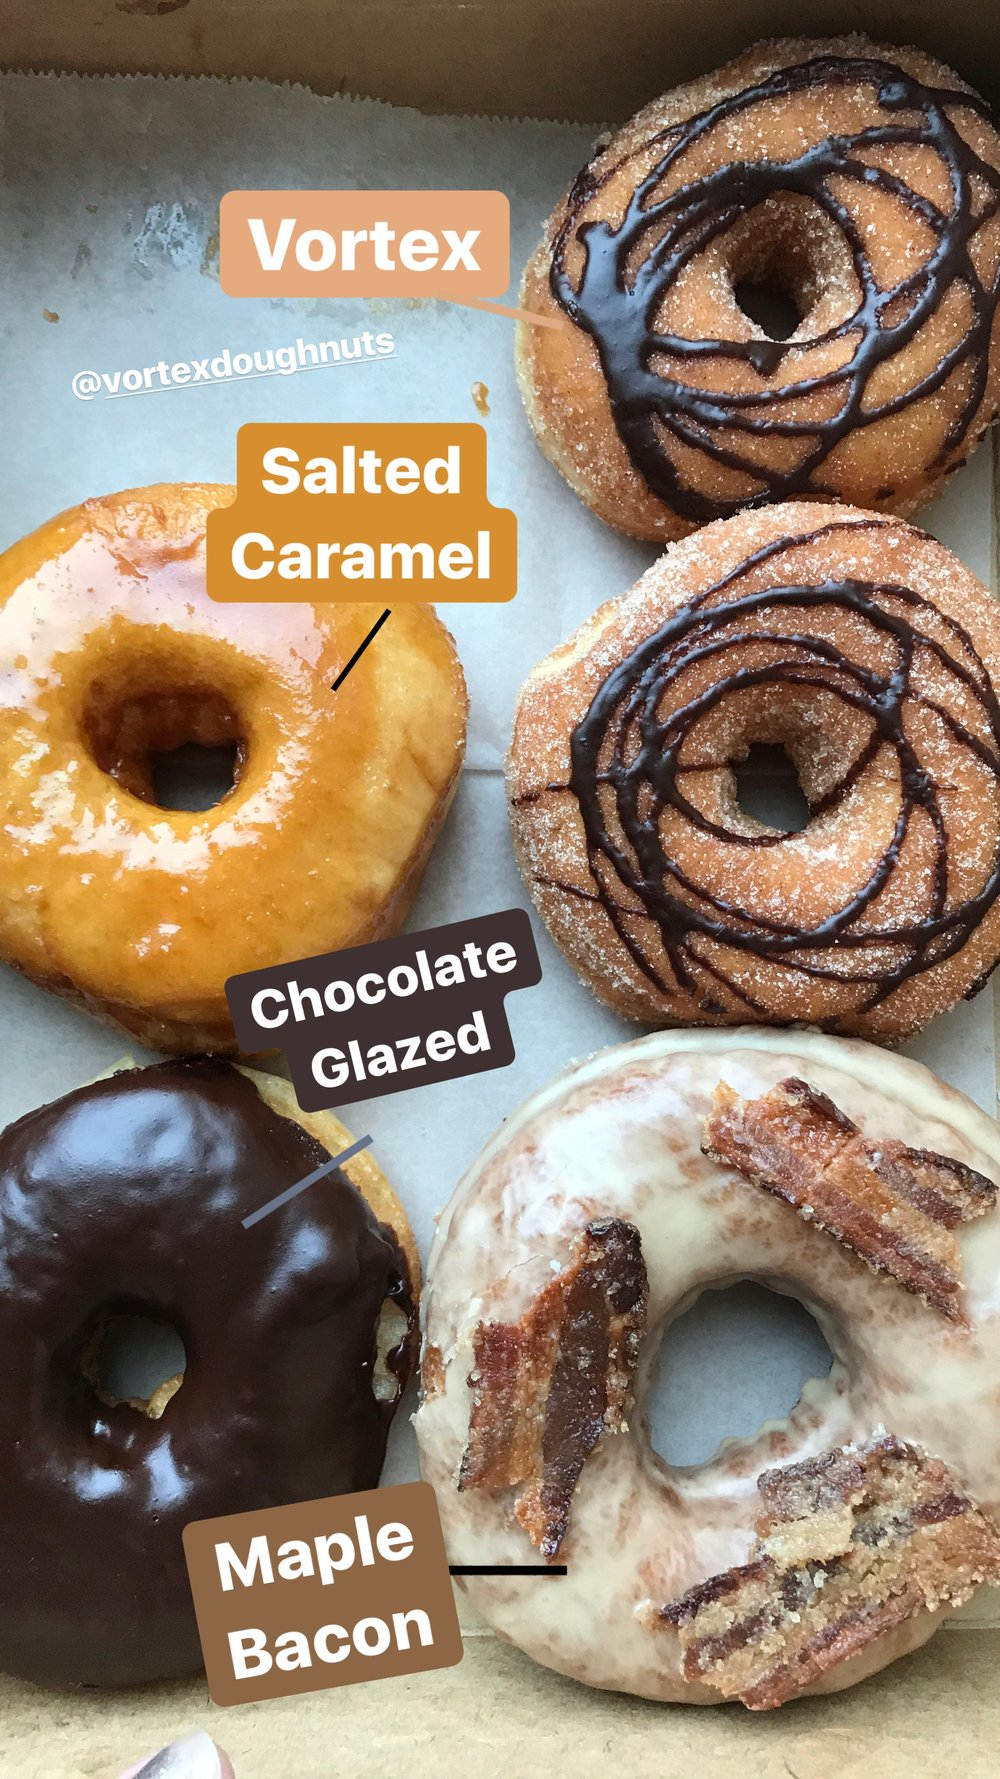 These donutsssssss